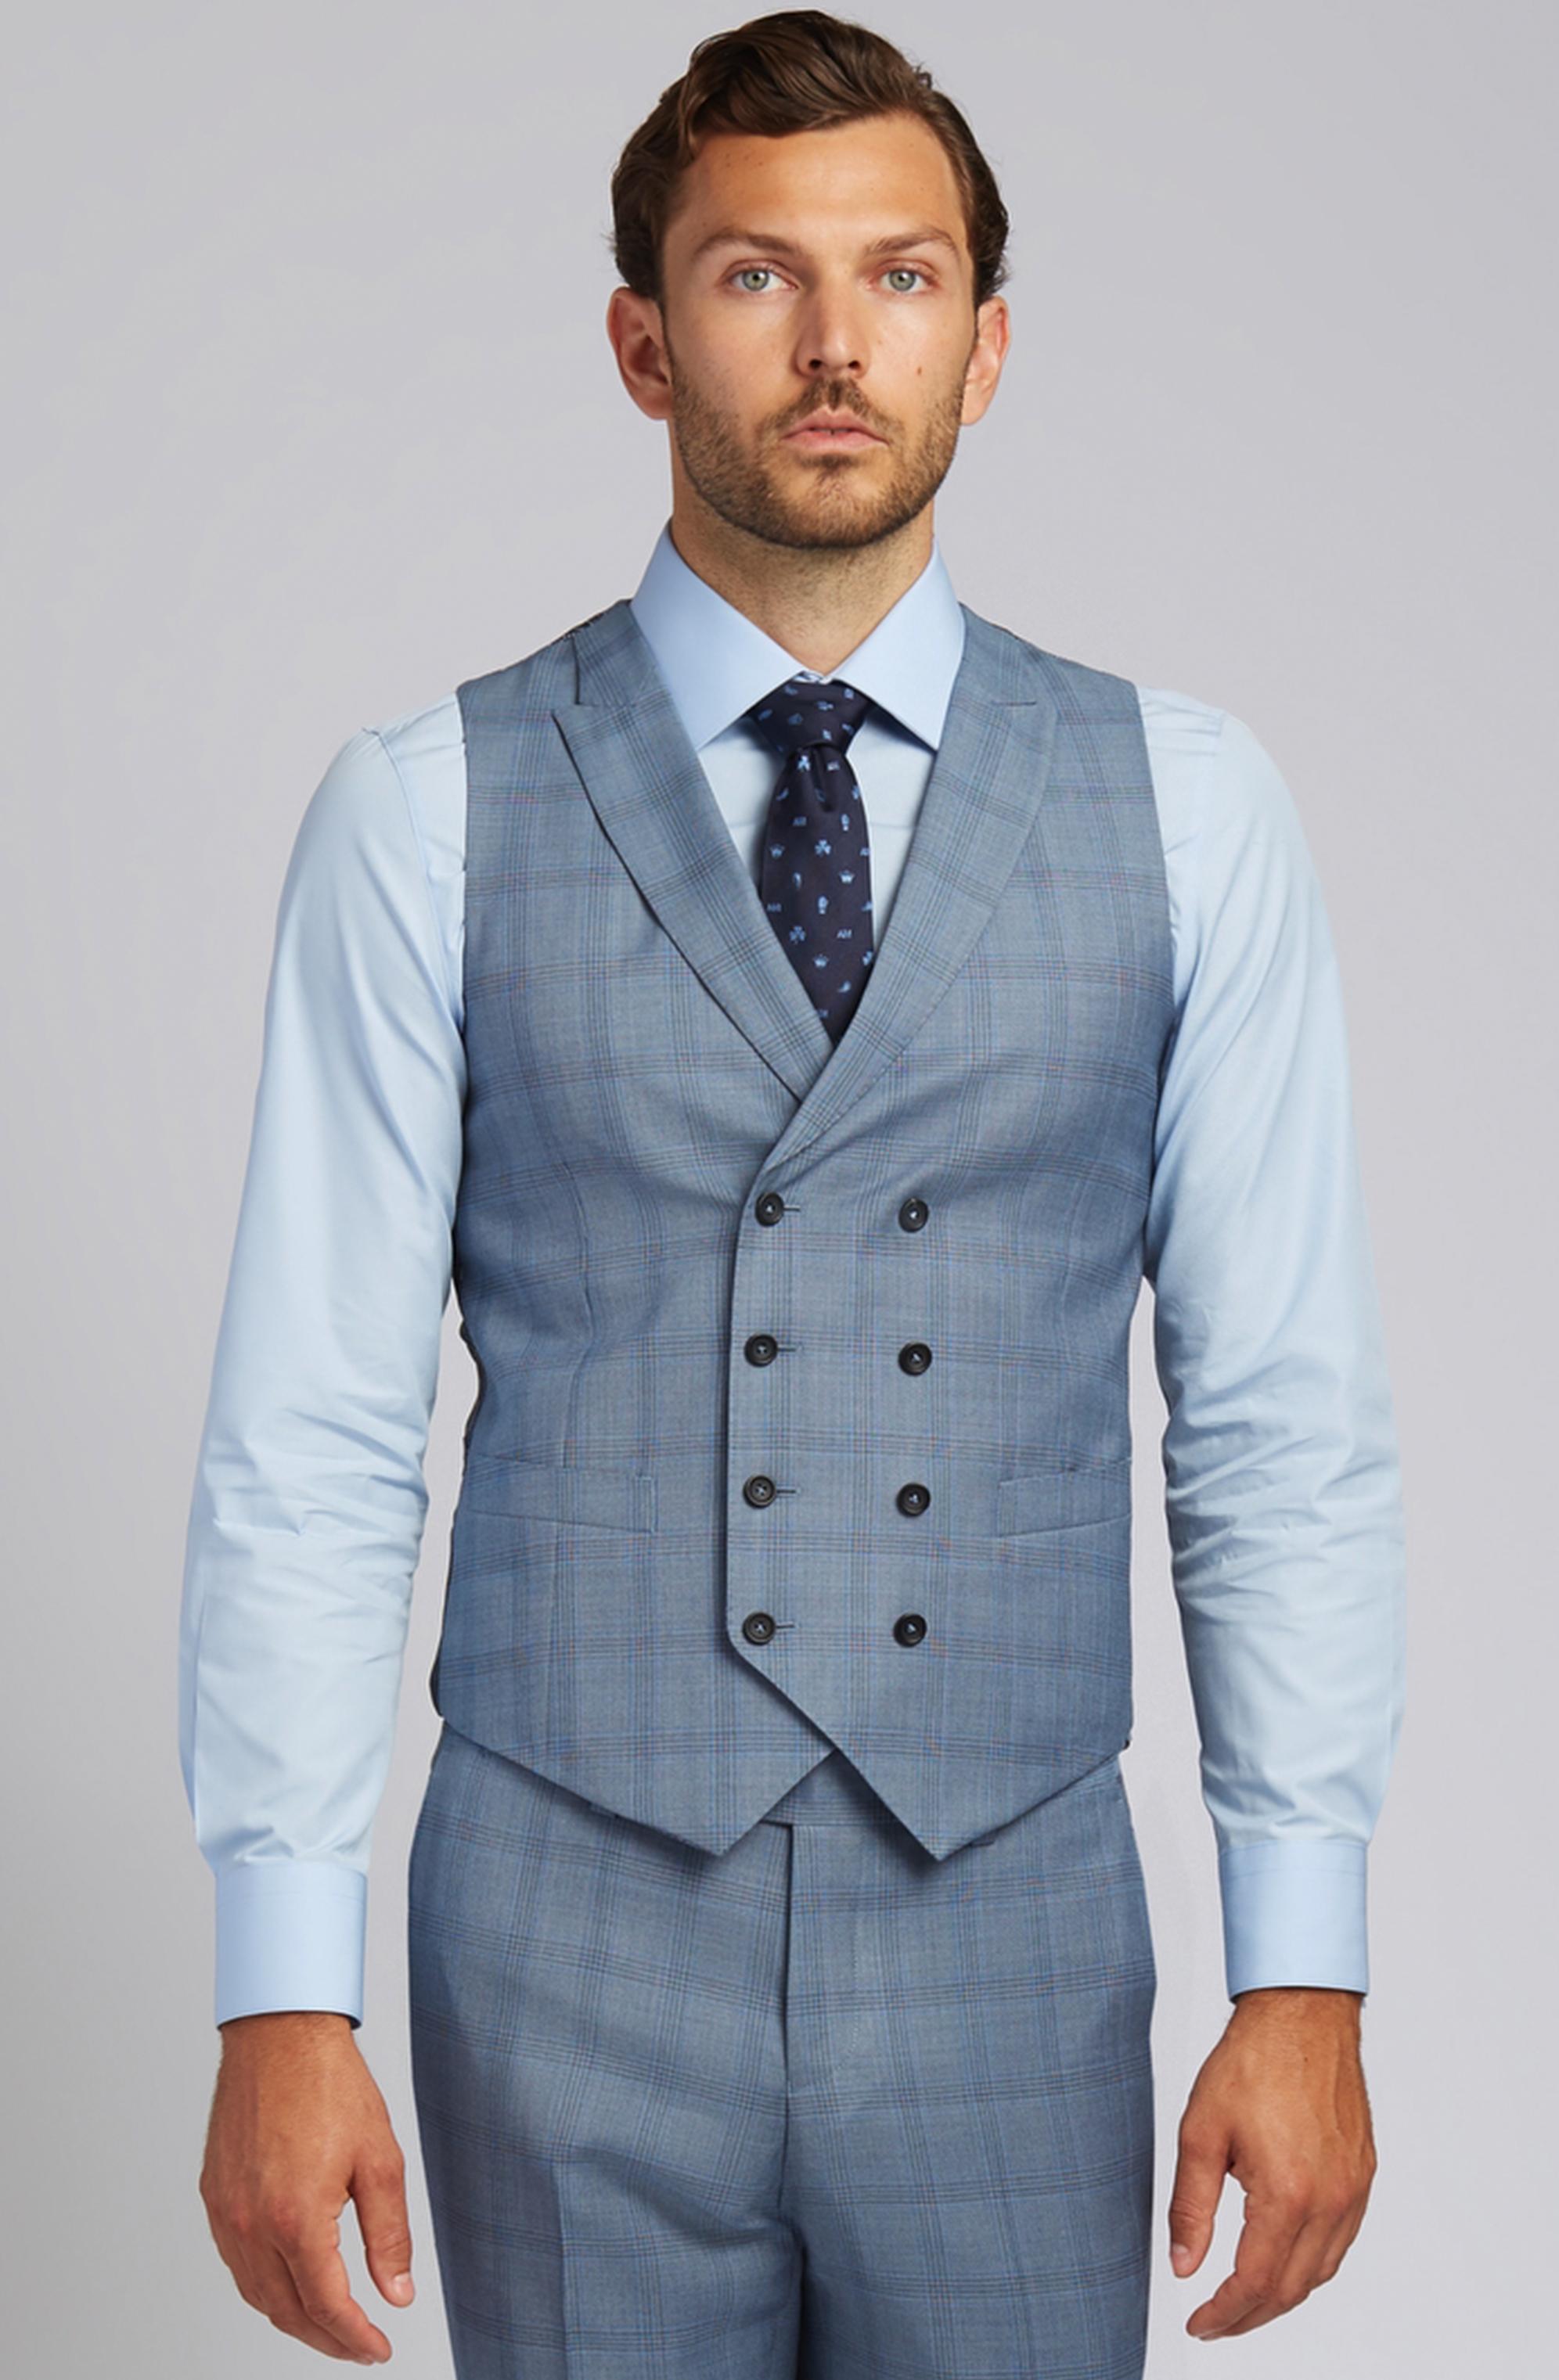 Slim-fit Super 130s Wool Vest in Steel Blue Glen Plaid